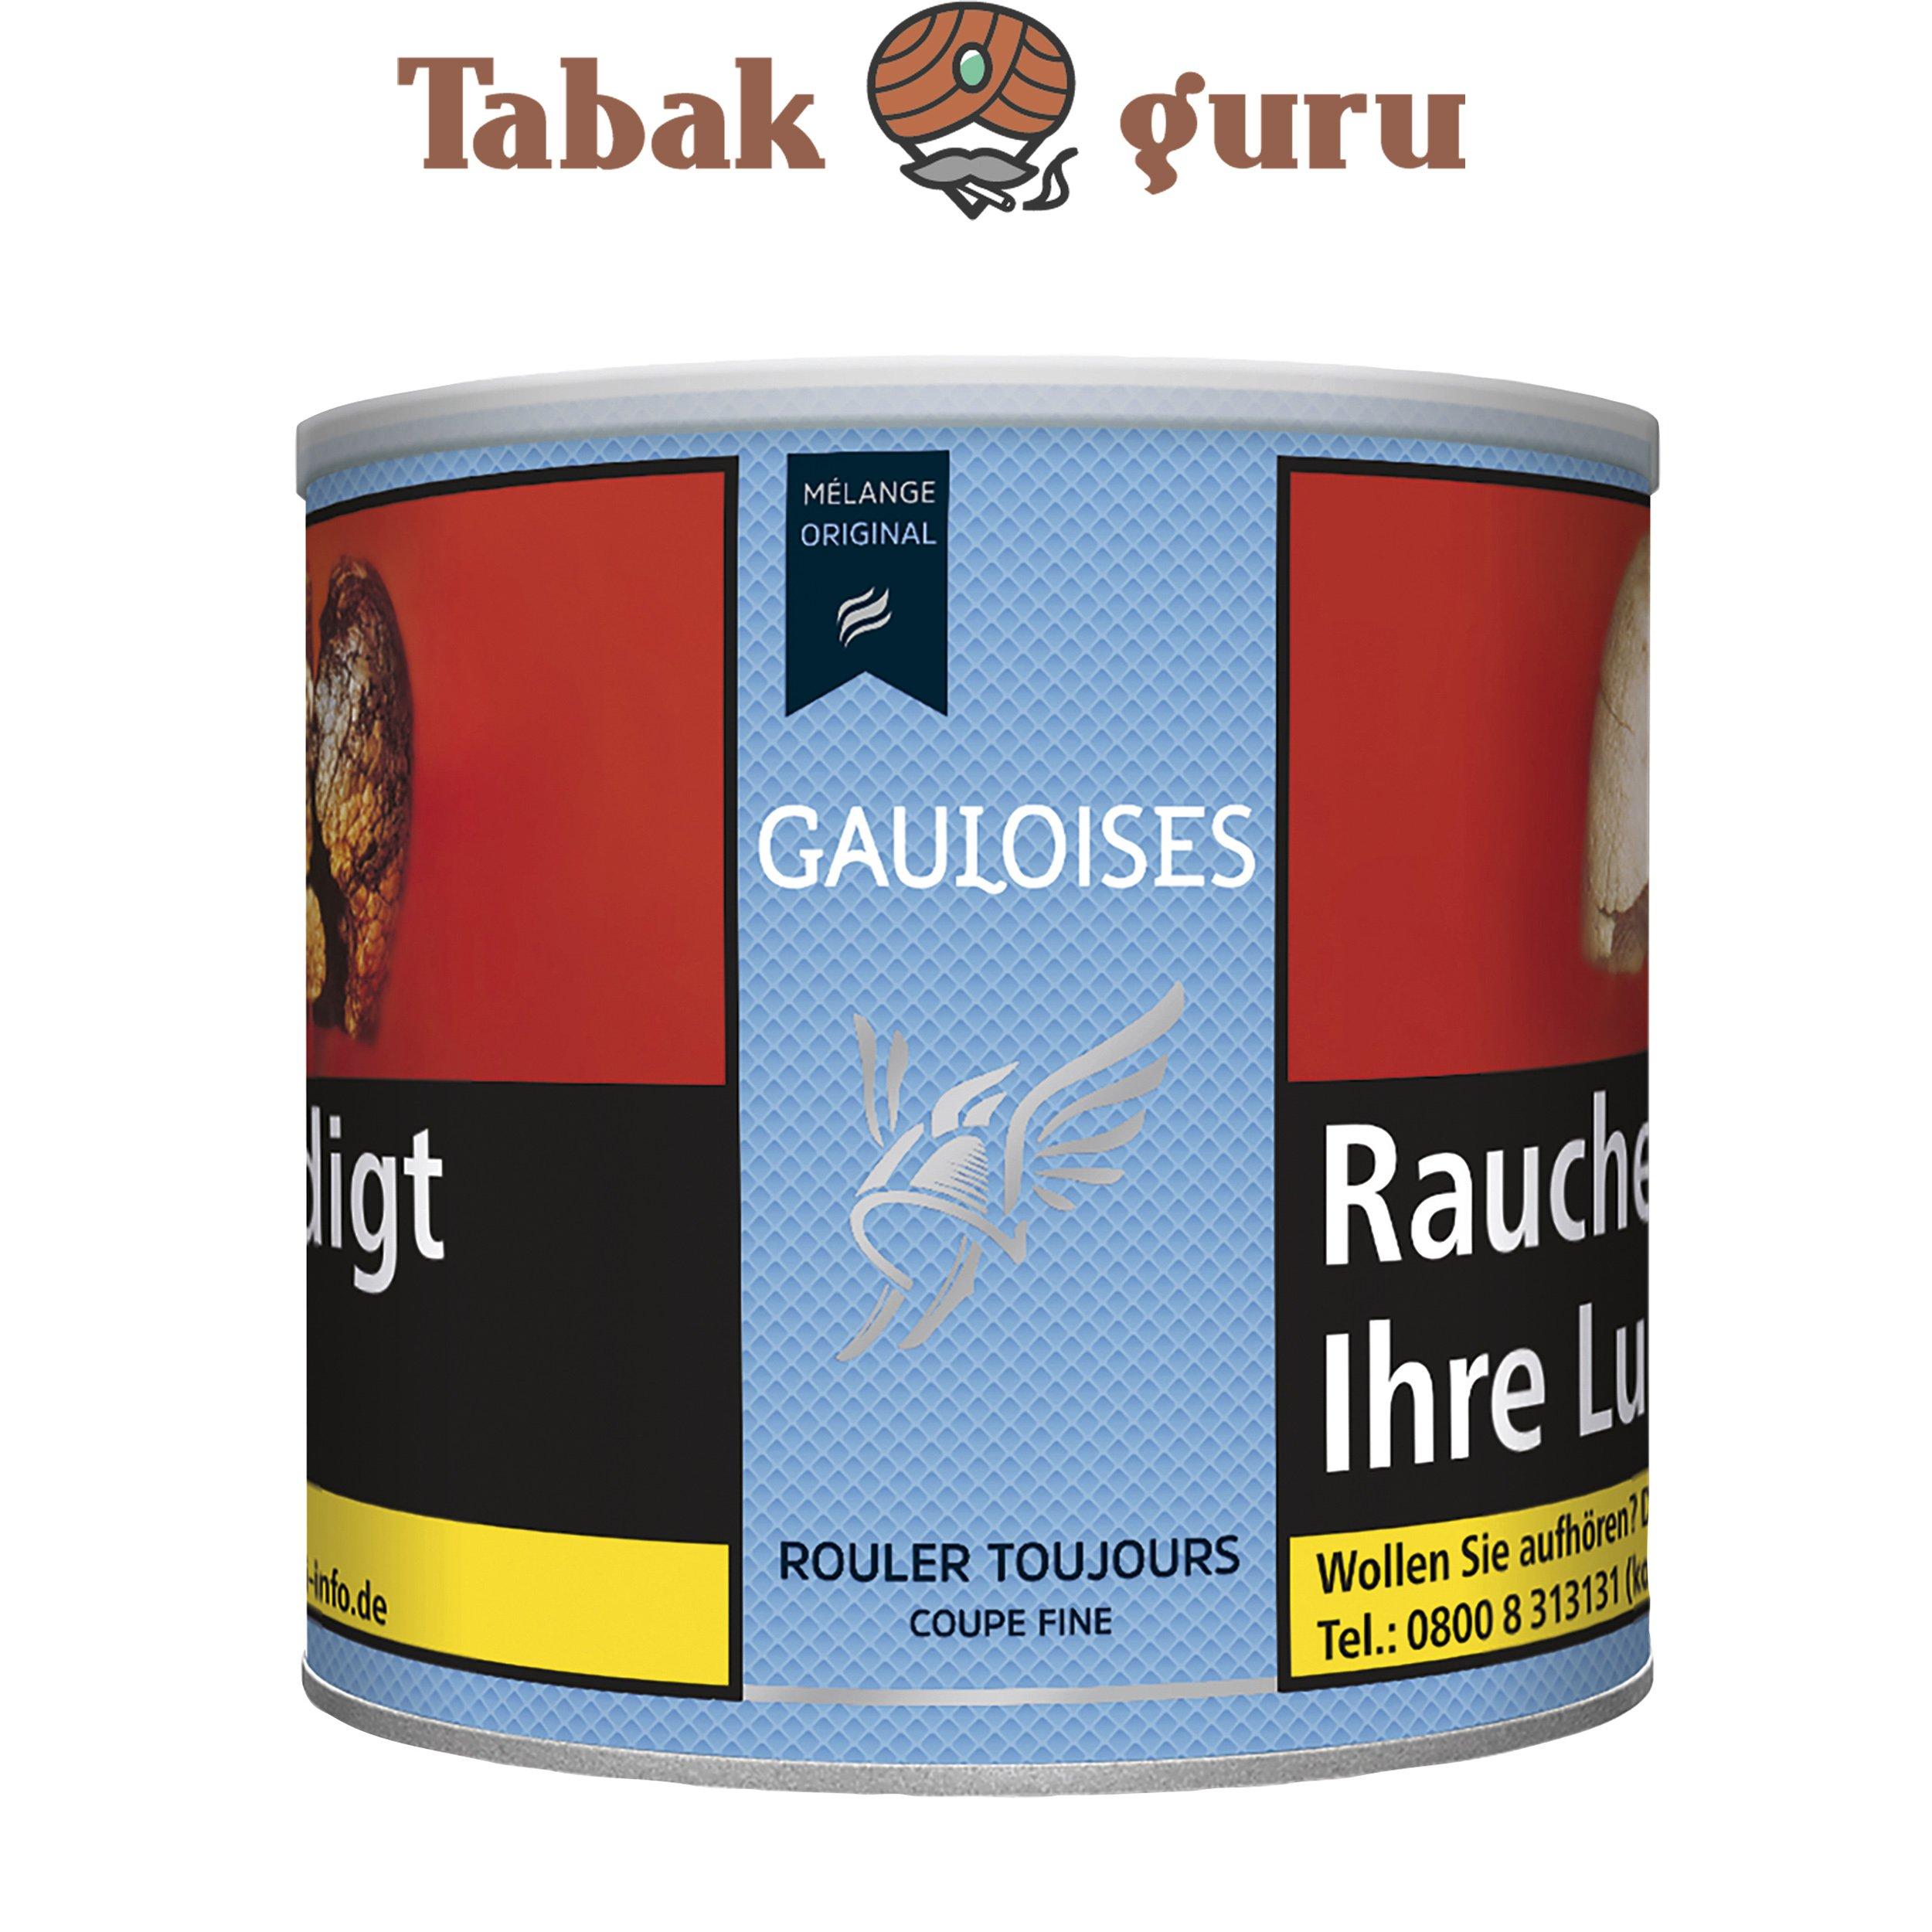 Gauloises Melange Original Drehtabak 100 g Dose